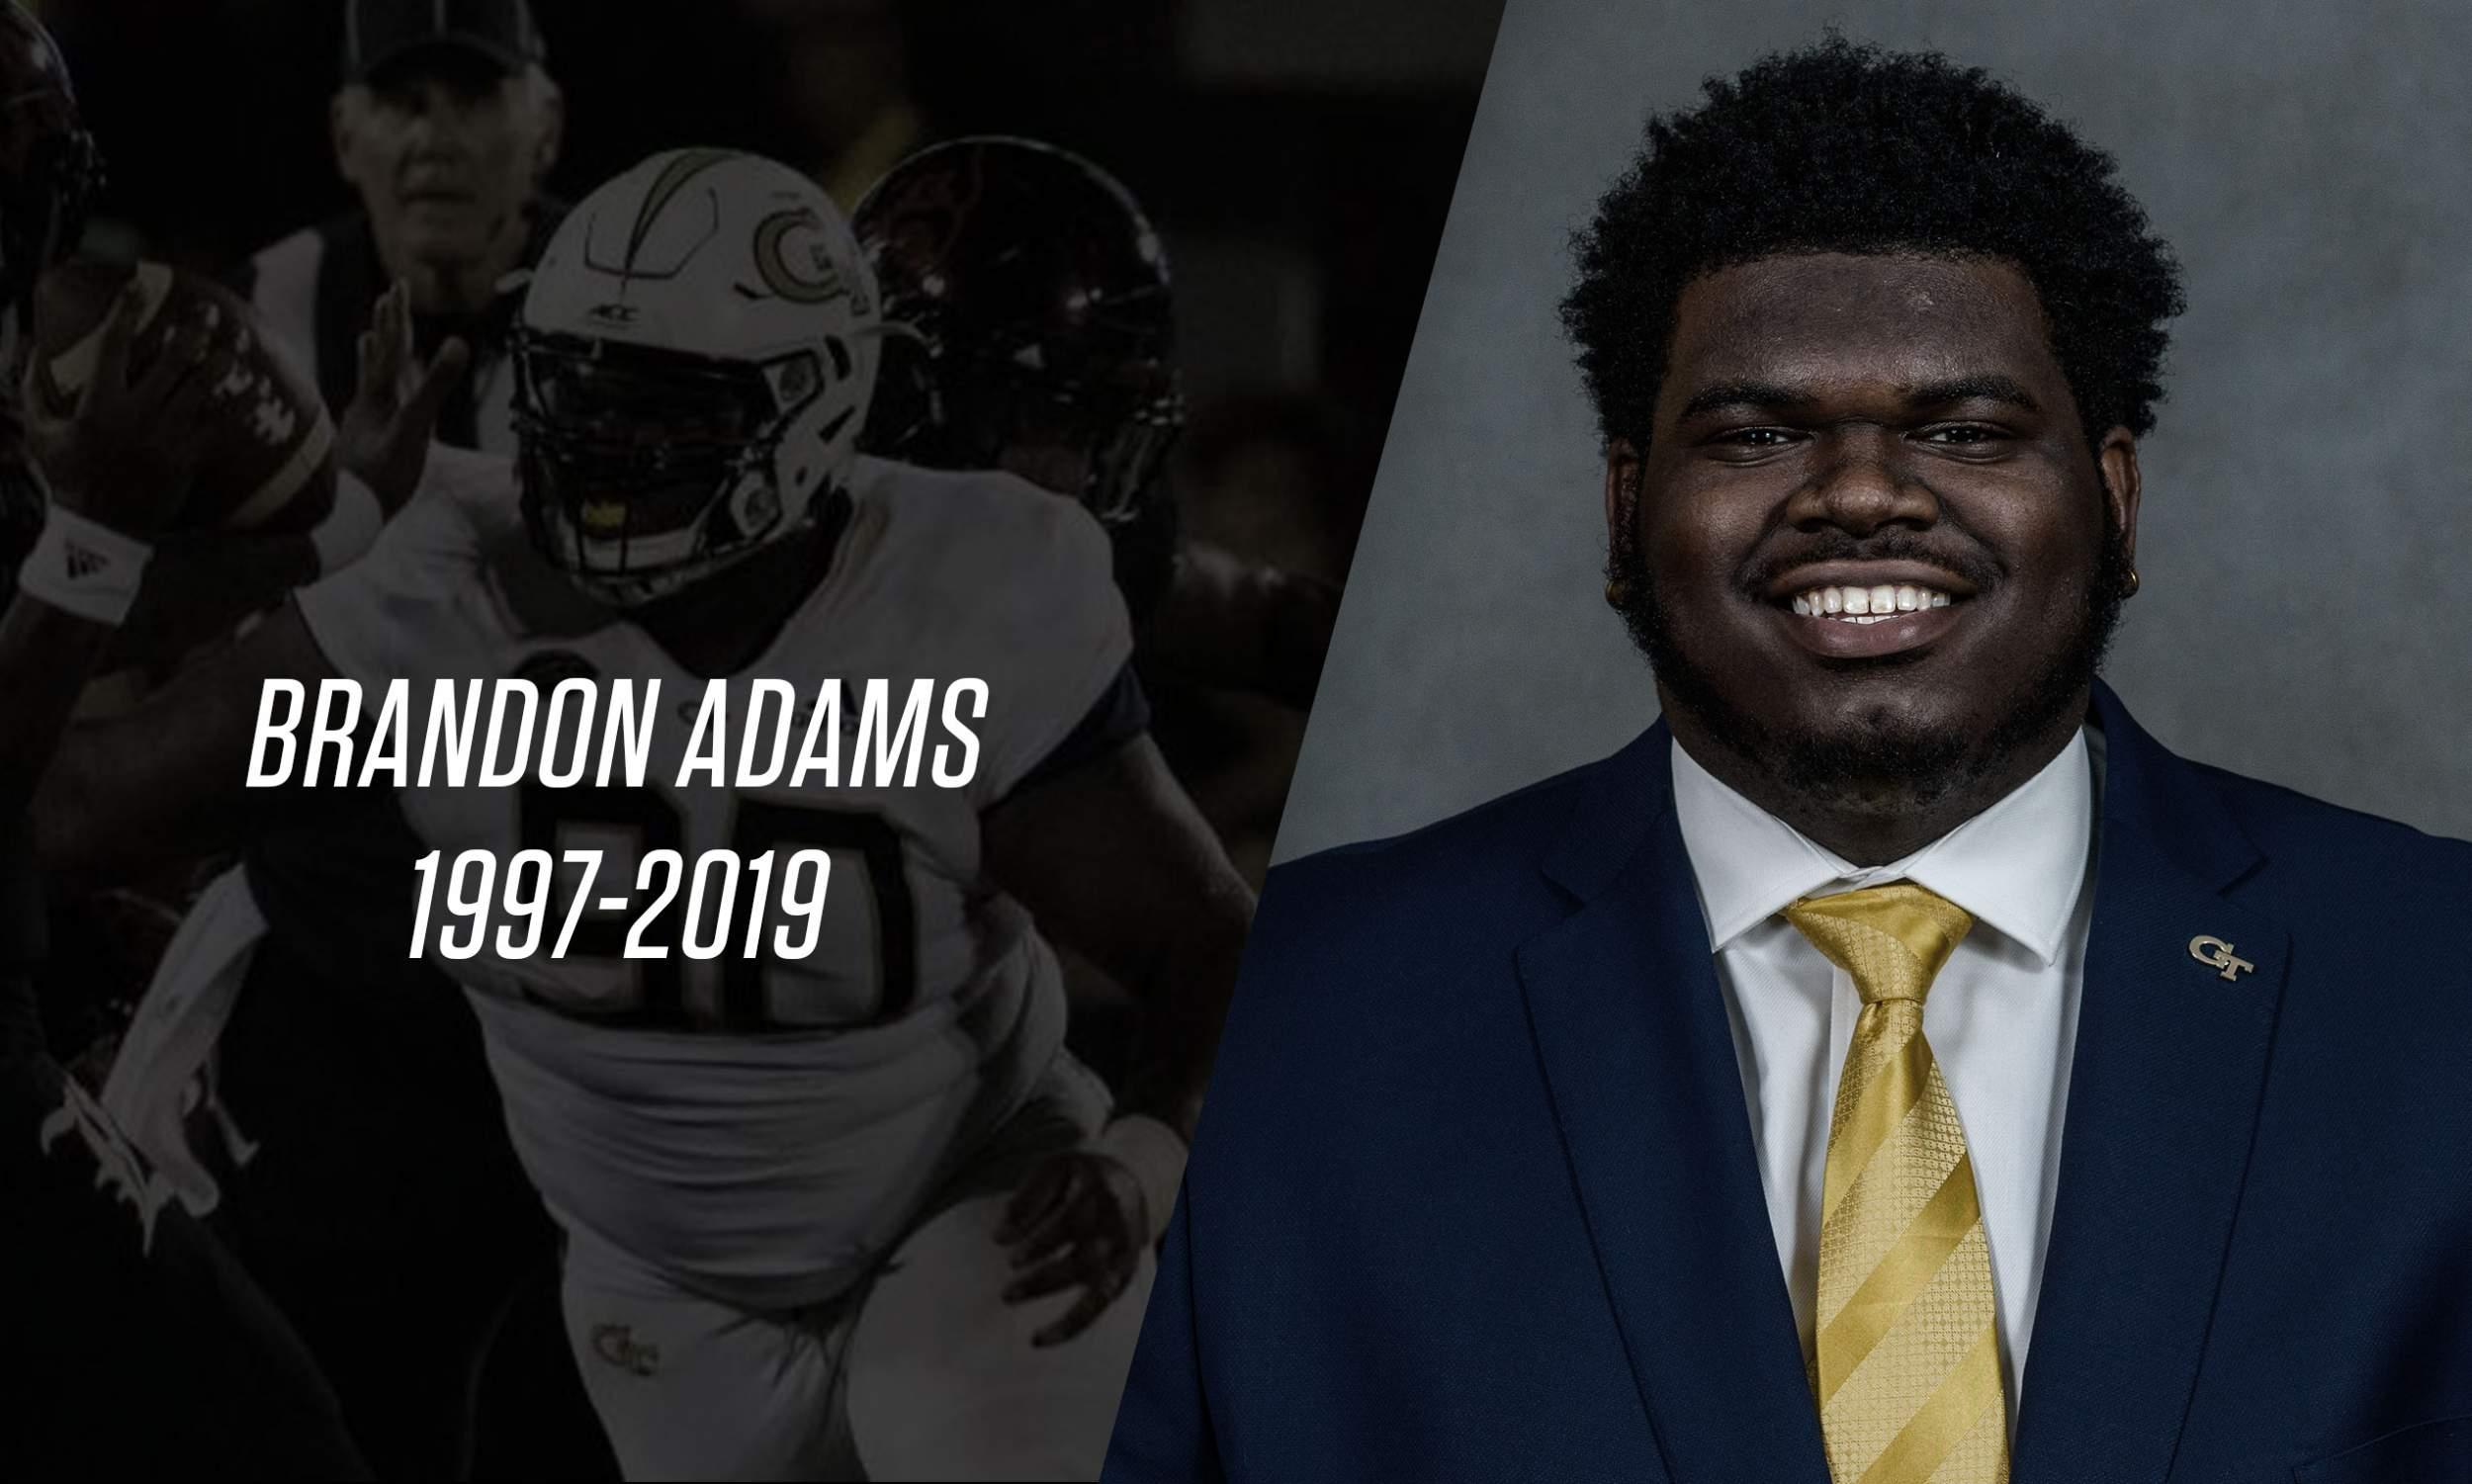 https://ramblinwreck.com/georgia-tech-athletics-mourns-the-loss-of-brandon-adams/